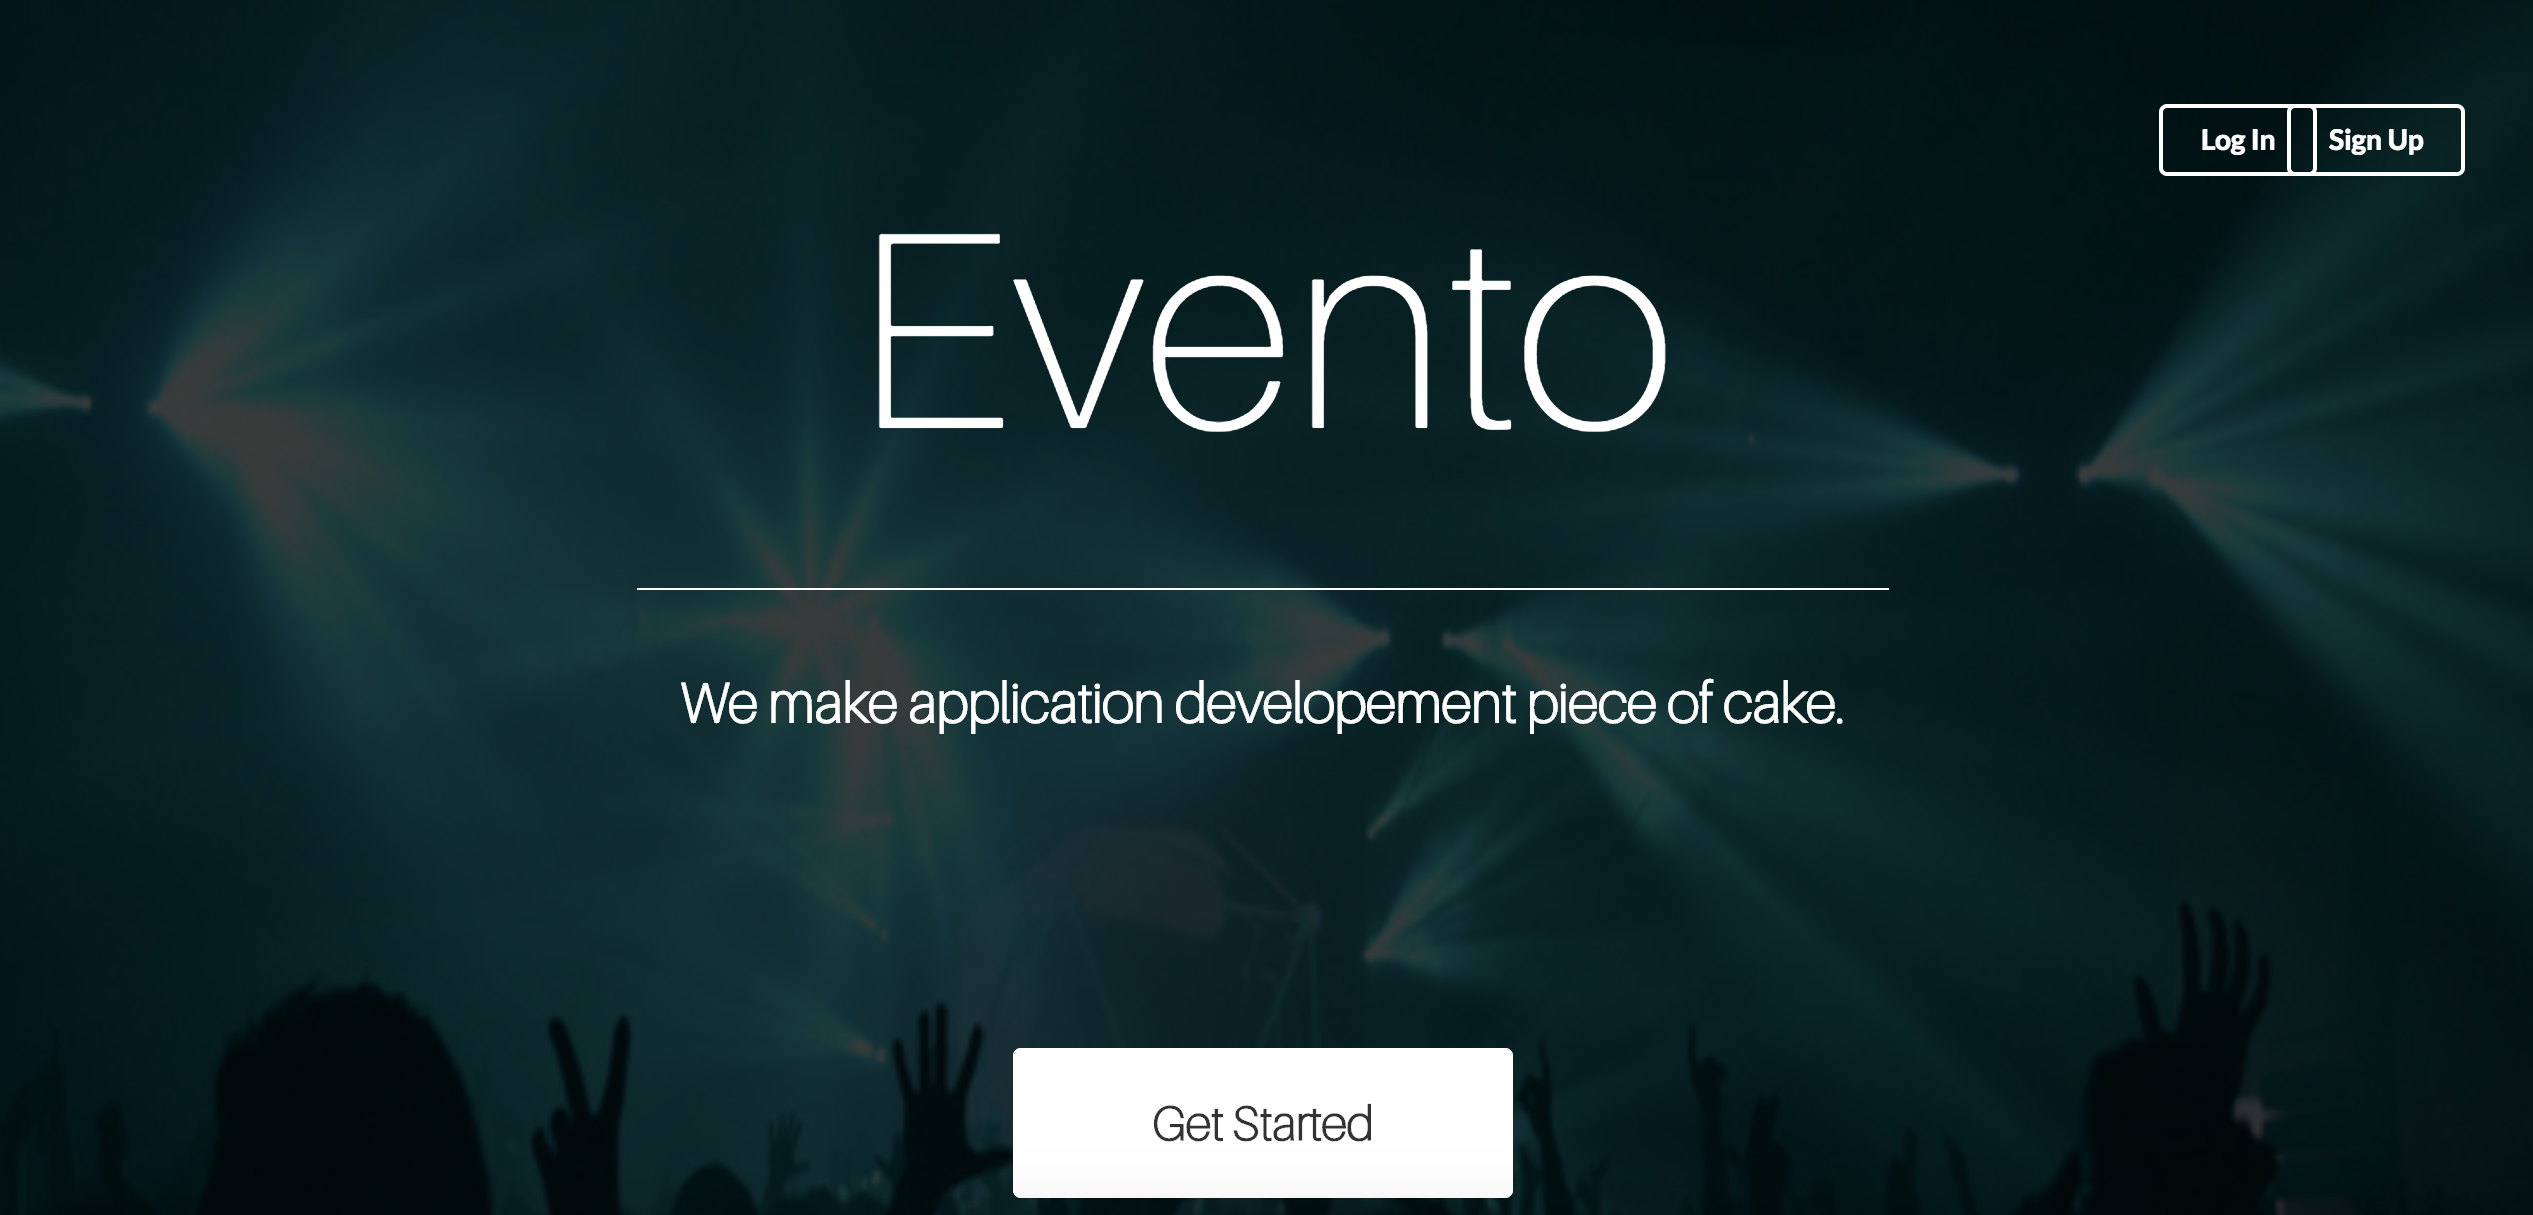 GitHub - utkarshnath/Android-App-Generator-Server